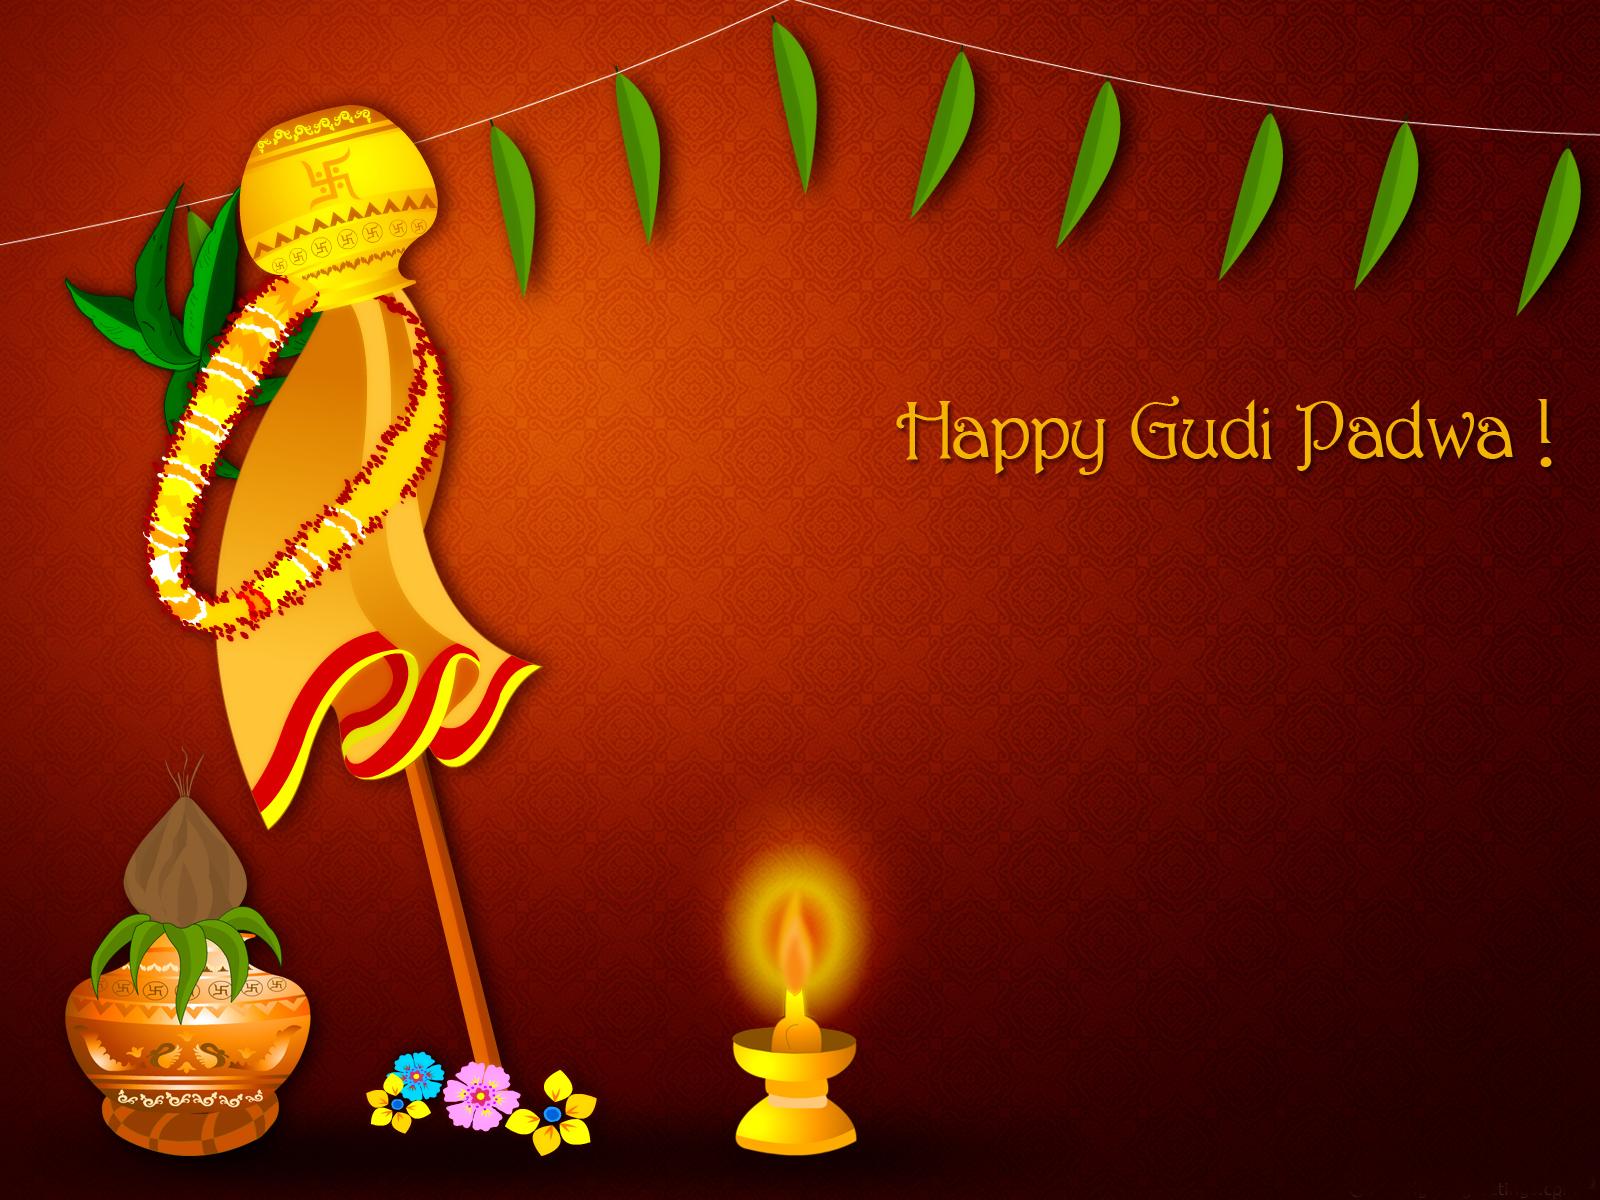 Gudi Padwa Images For Whatsapp Dp Profile Wallpapers Free